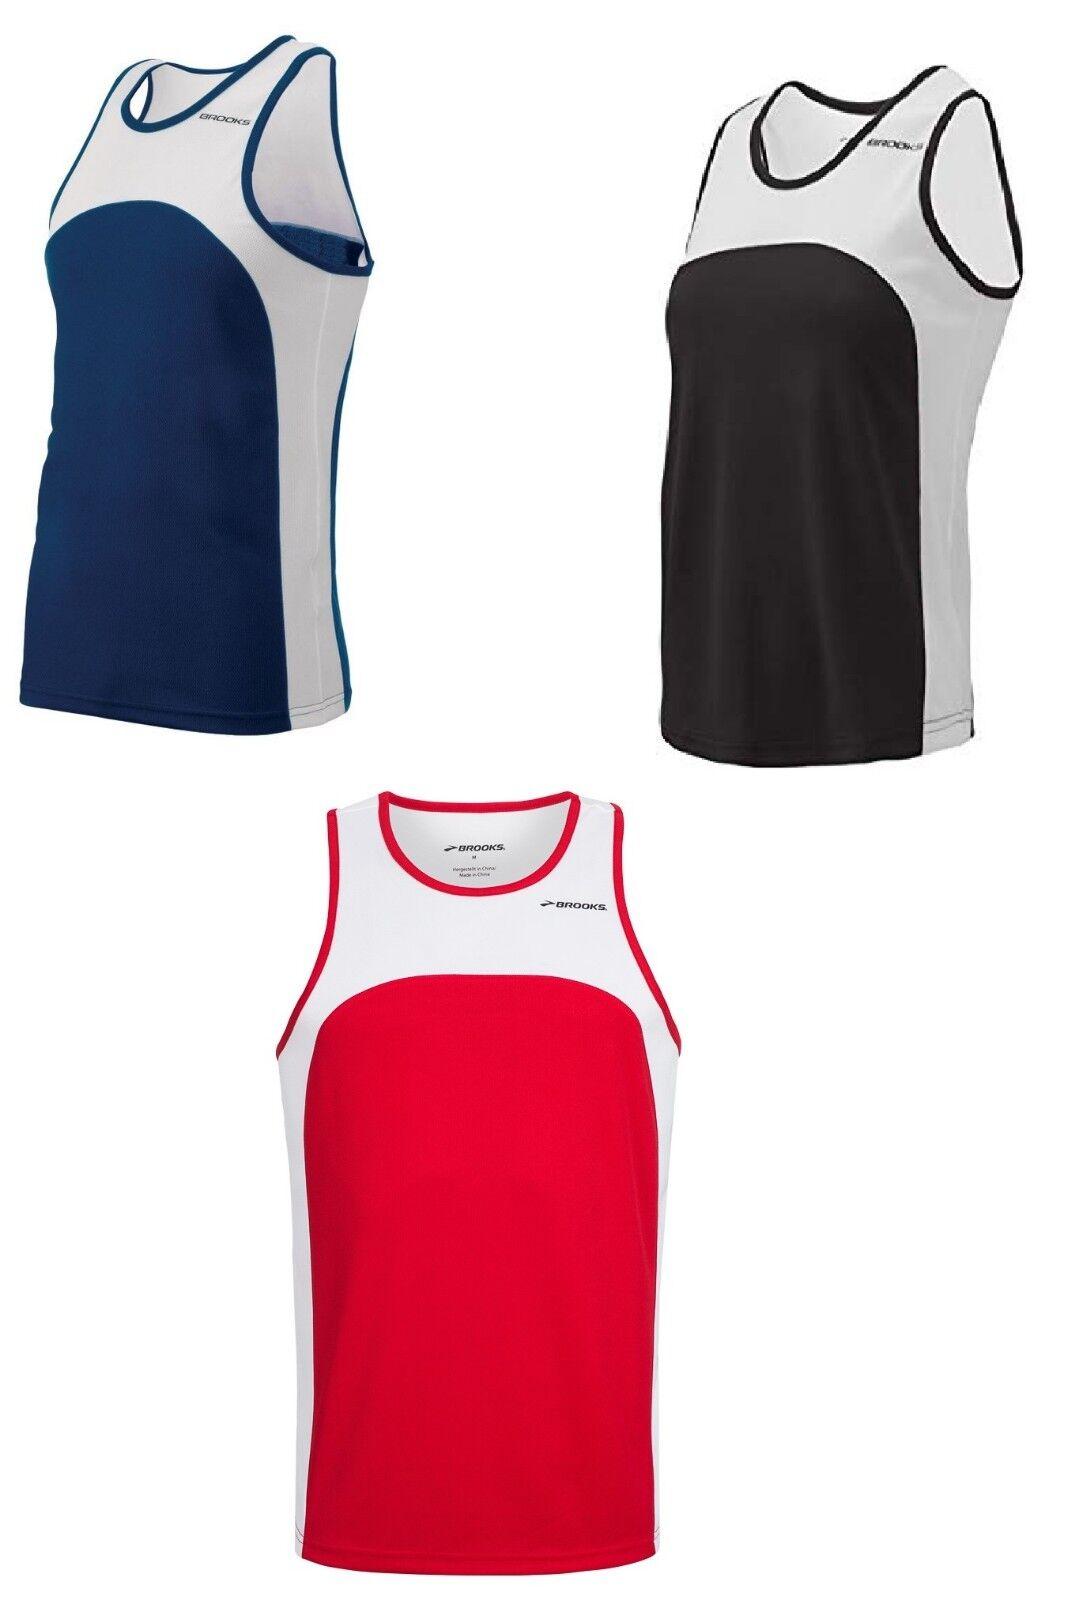 Brooks Sprint Running Singlet Navy Mens Vest Gym Training Workout Tank Top